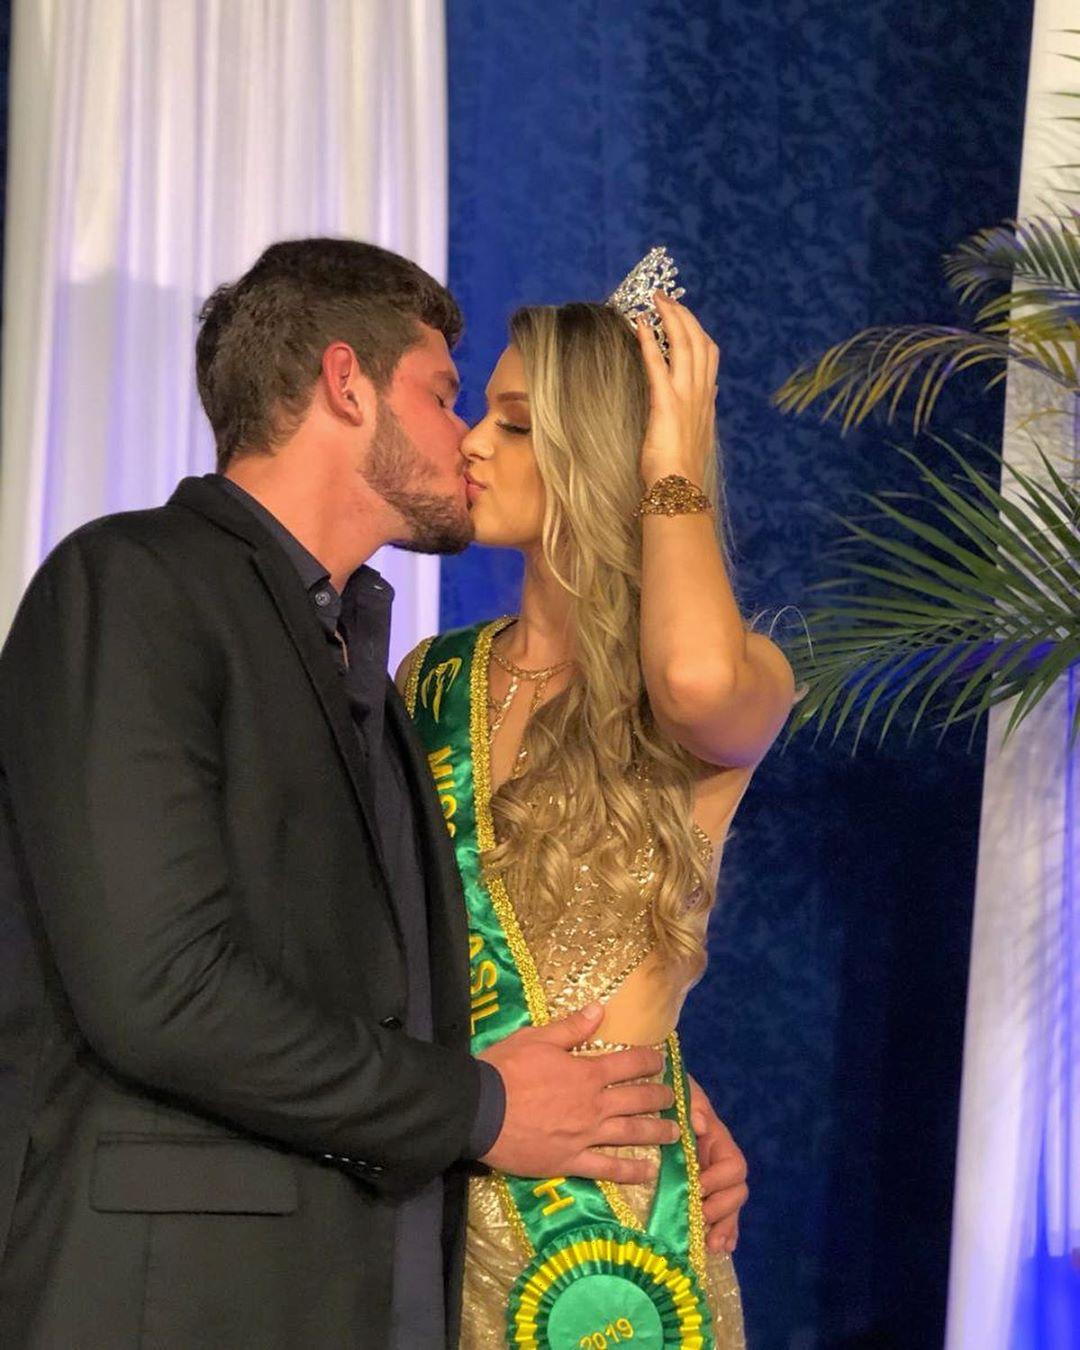 maria gabriela batistela, miss brasil terra 2019. - Página 4 59764910